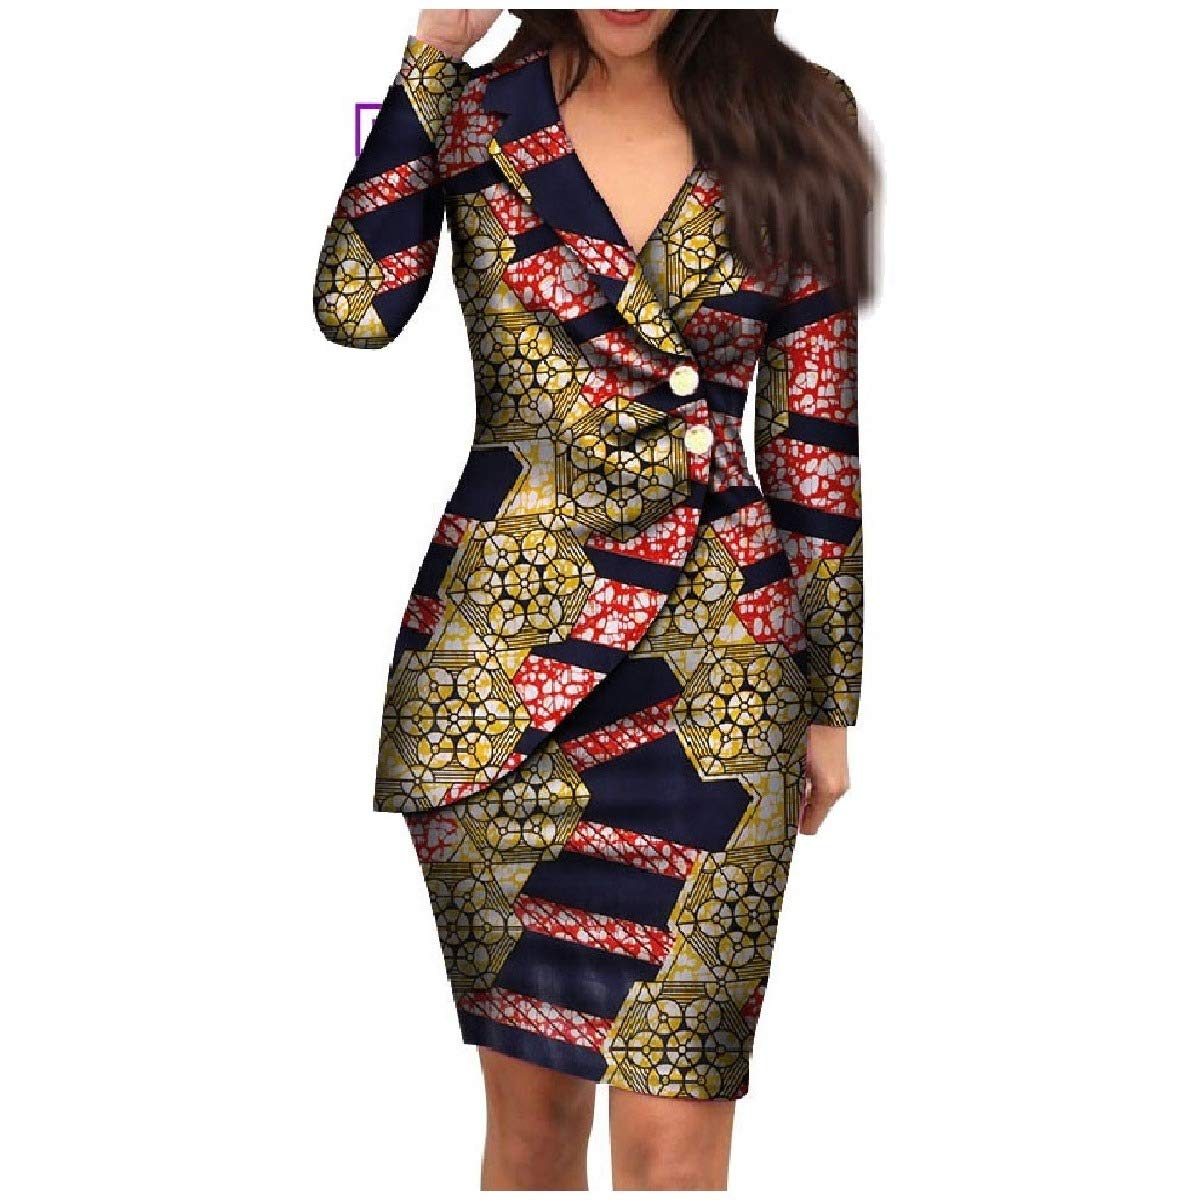 2 HEFASDM Women's Dashiki Elegent Blazer African Printed Premium Back Cotton Dress